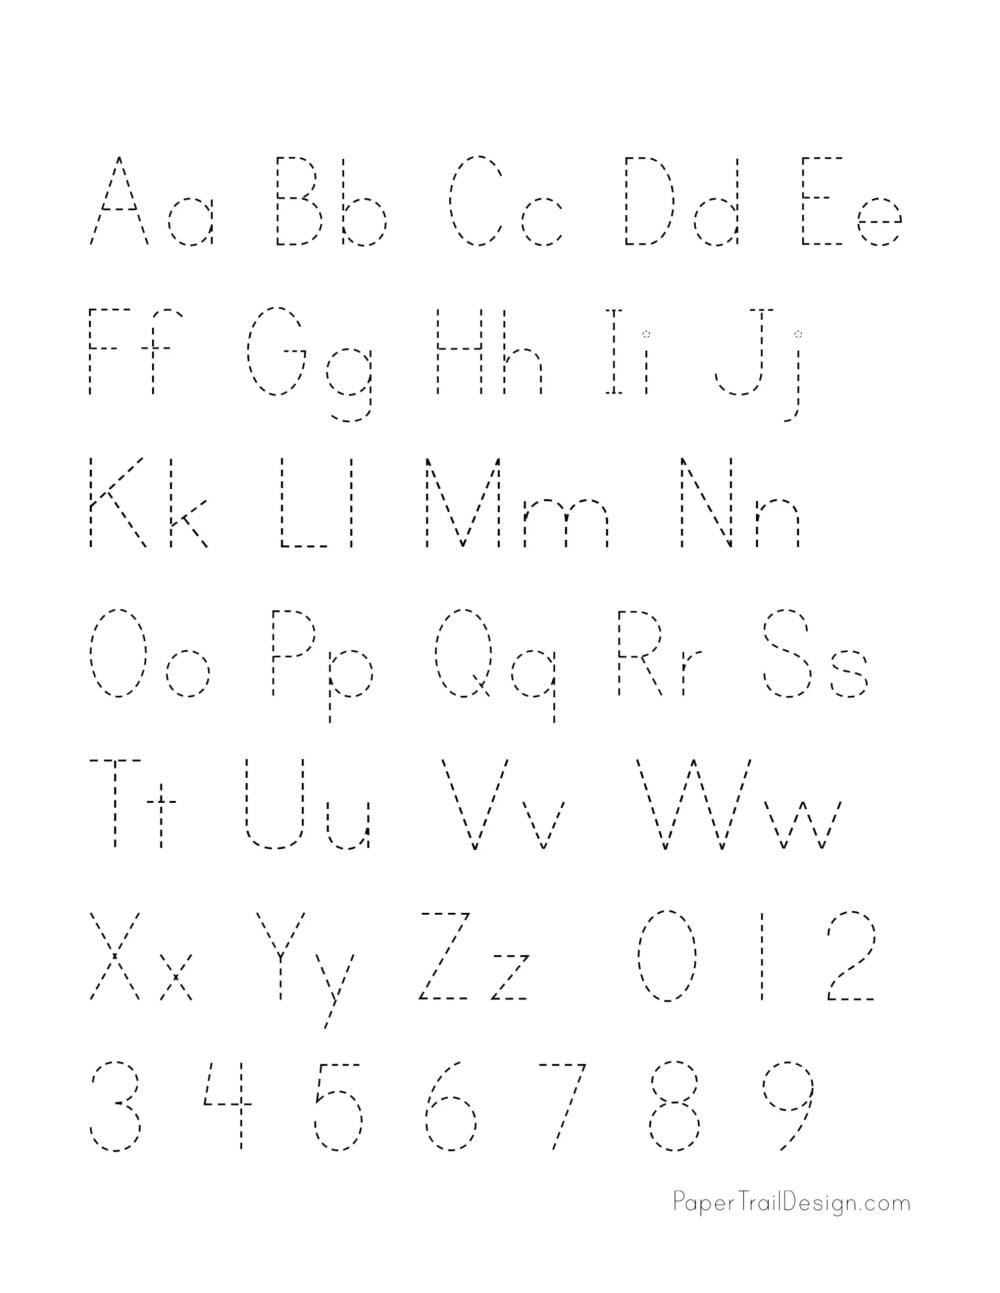 medium resolution of Free Printable Alphabet Handwriting Practice Sheets   Paper Trail Design